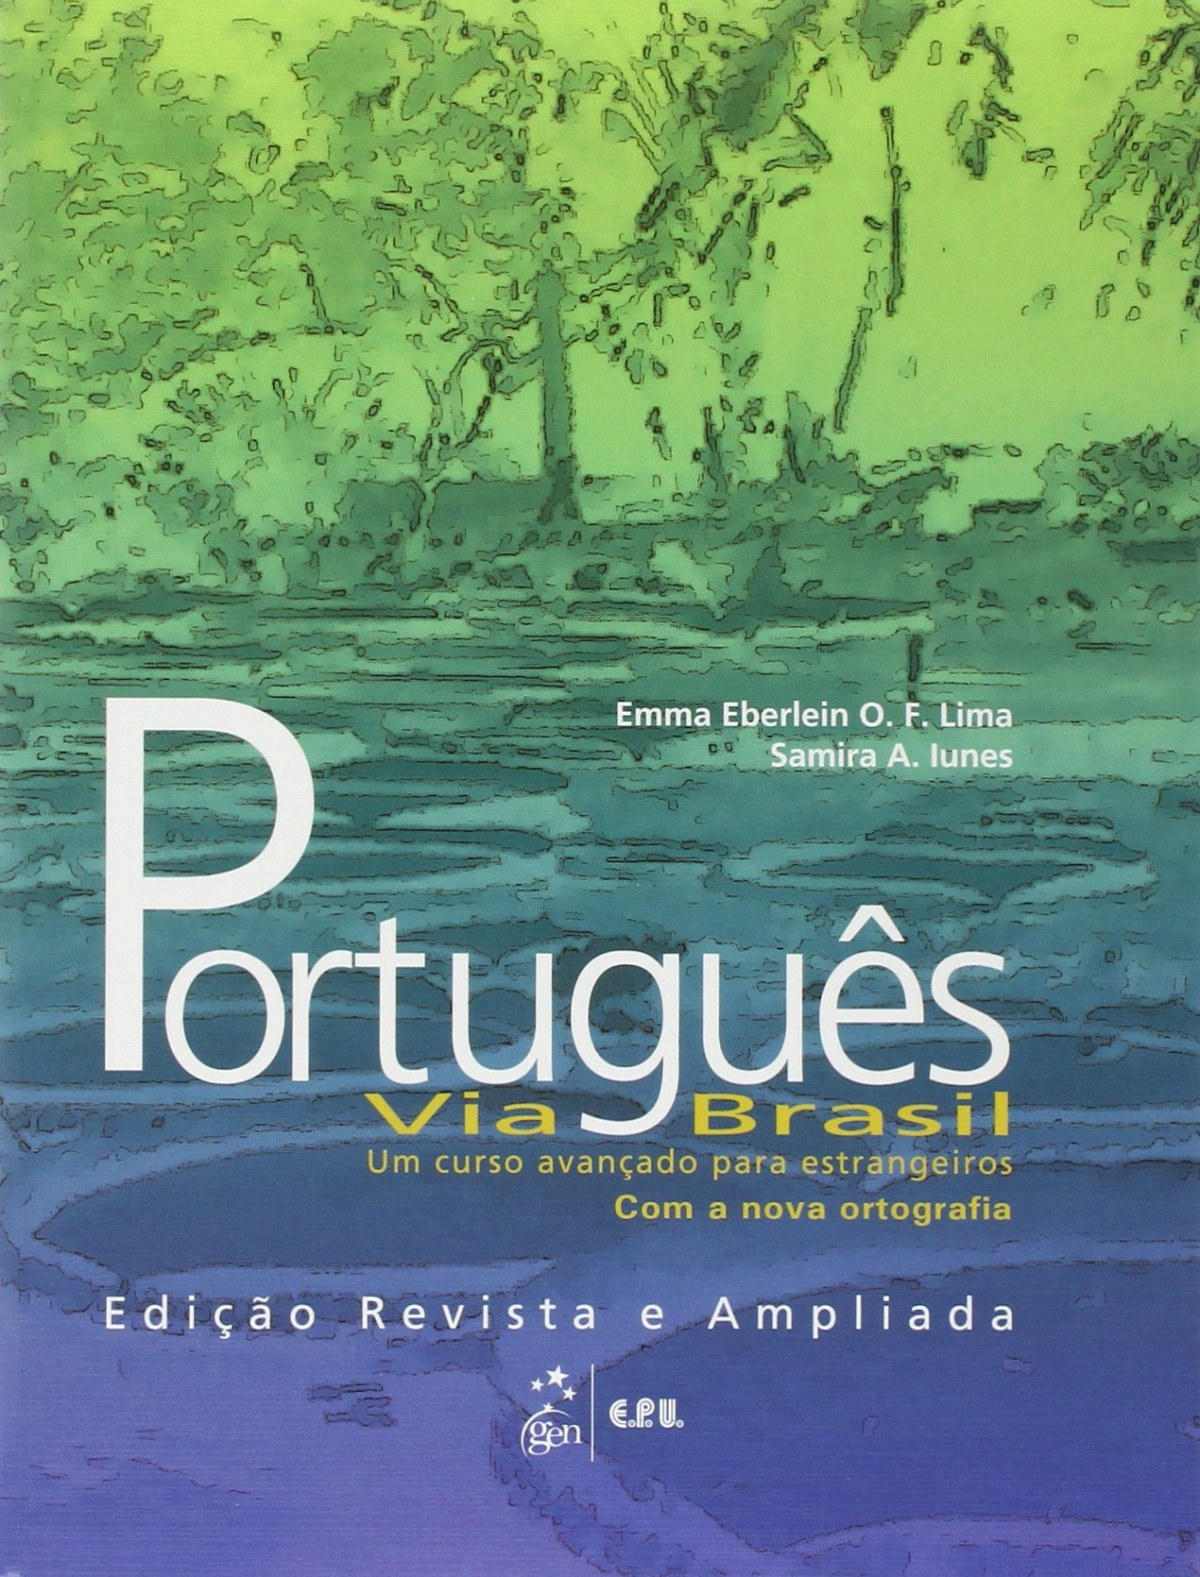 Português Via Brasil - Livro de Texto - Eberlein Lima, Emma